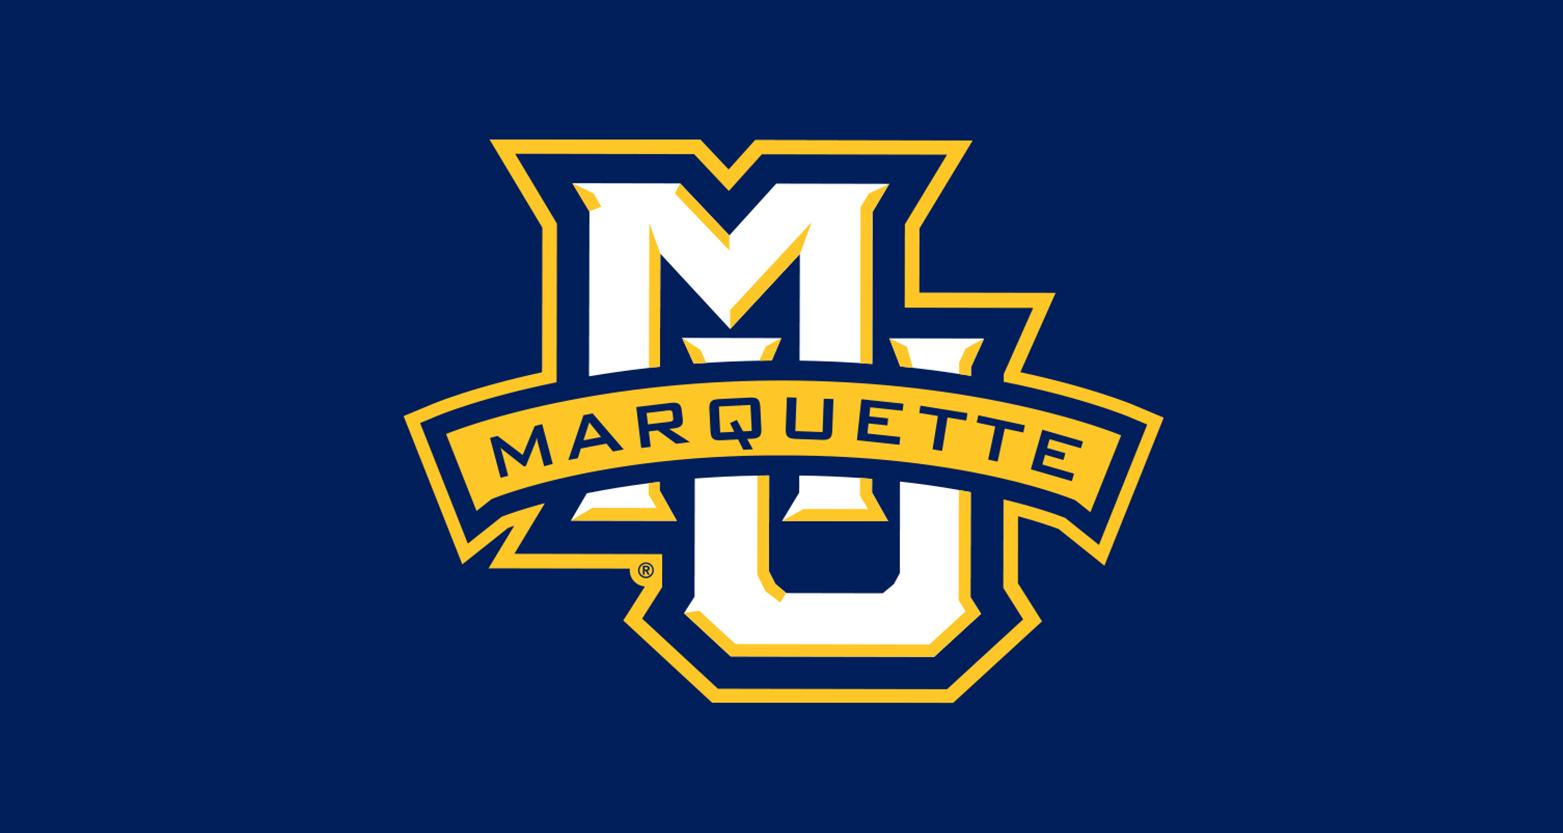 Designs Mob Marquette University